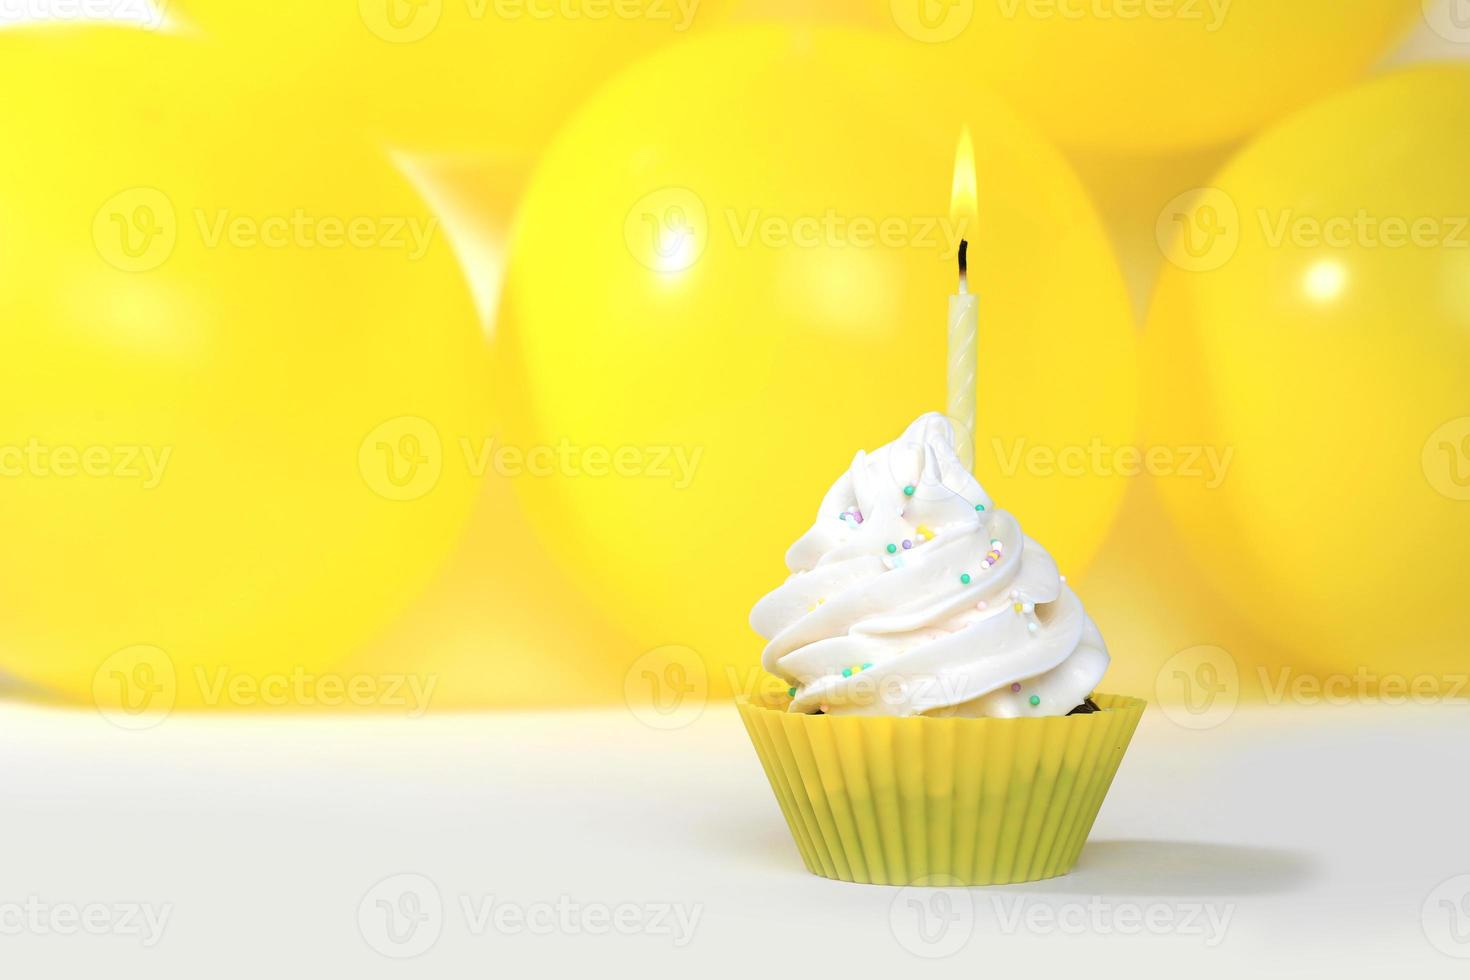 heldere gelukkige verjaardag cupcakes met kaarsen foto